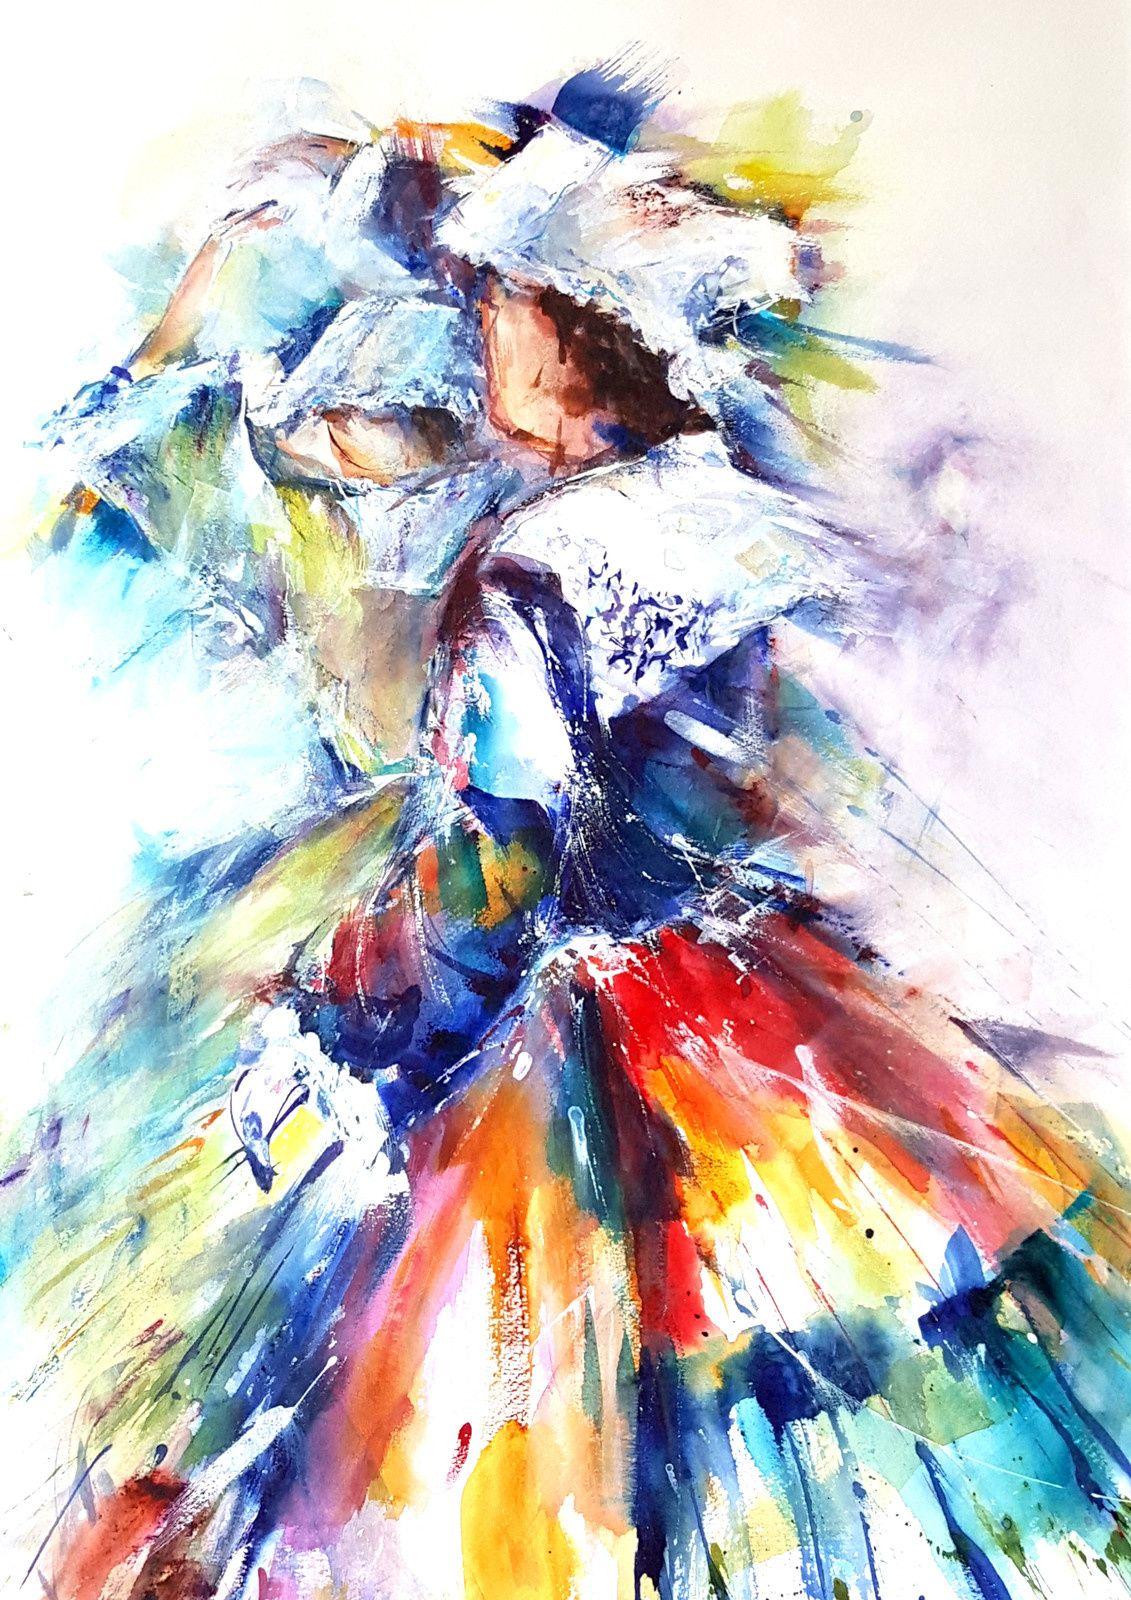 Belles Bretonnes Danse Aquarelles Bogard Cavarec Peinture Bretonne Breton Peinture